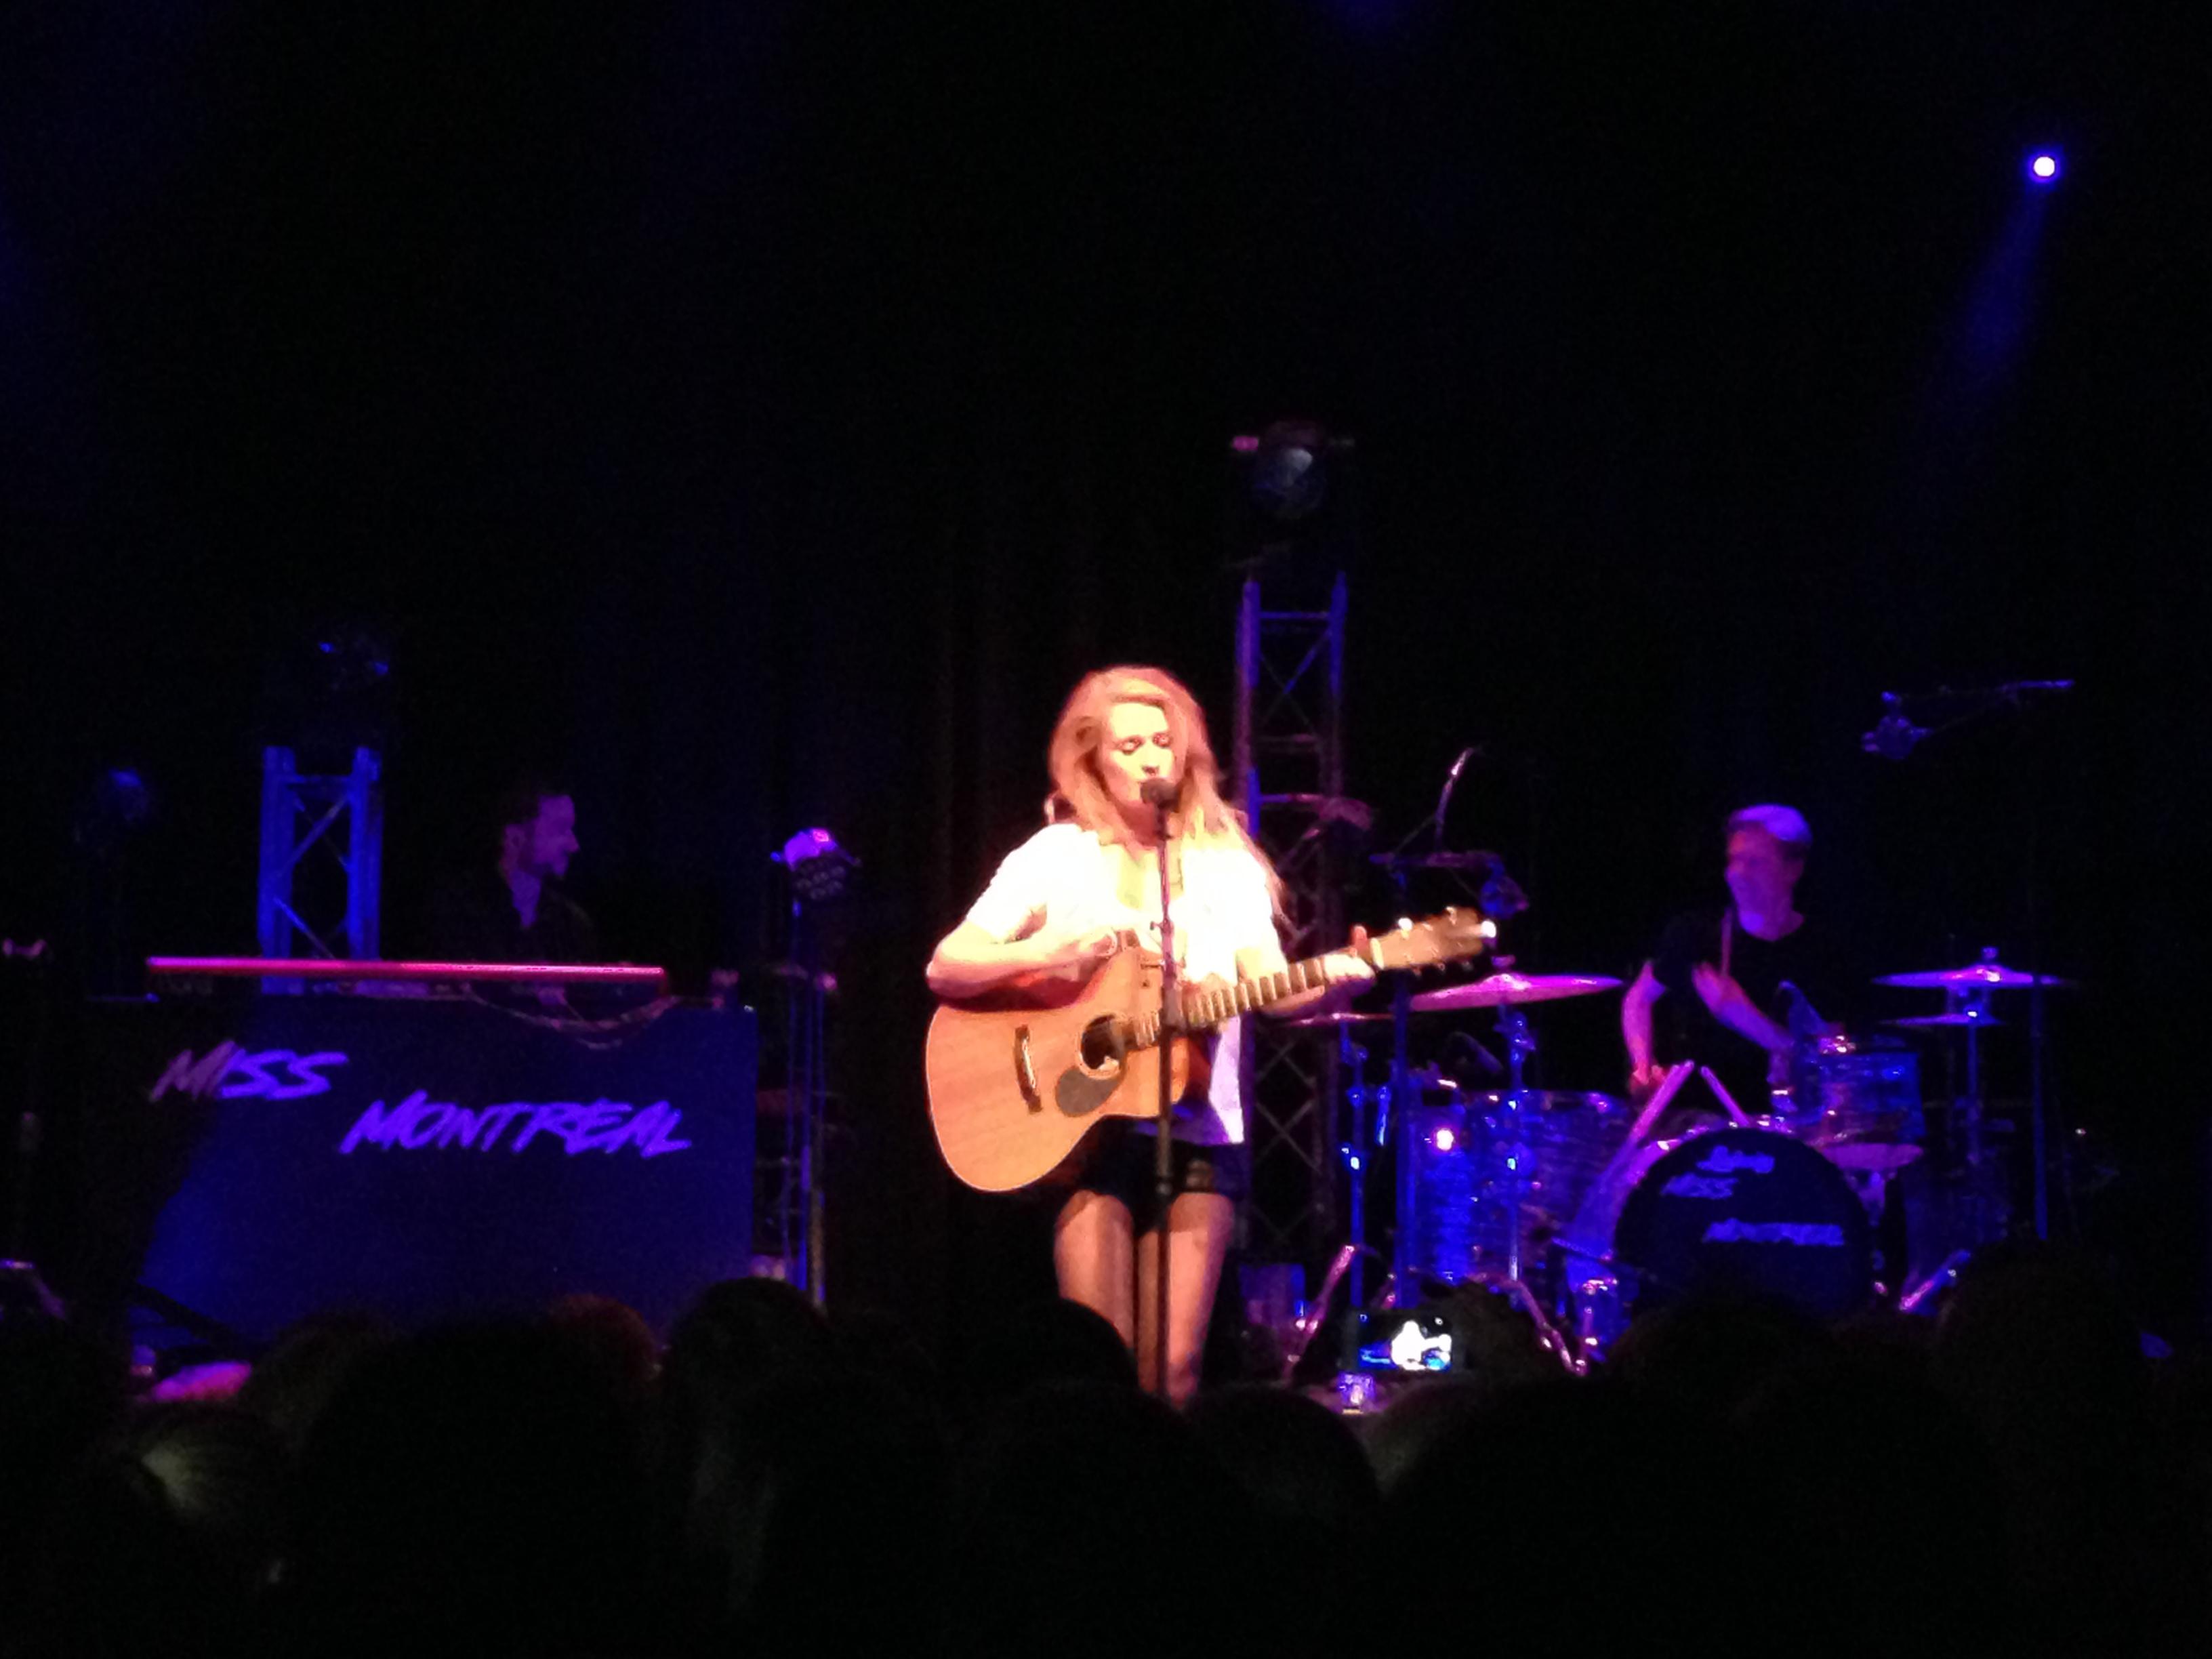 Concertreview: Not just a flirt